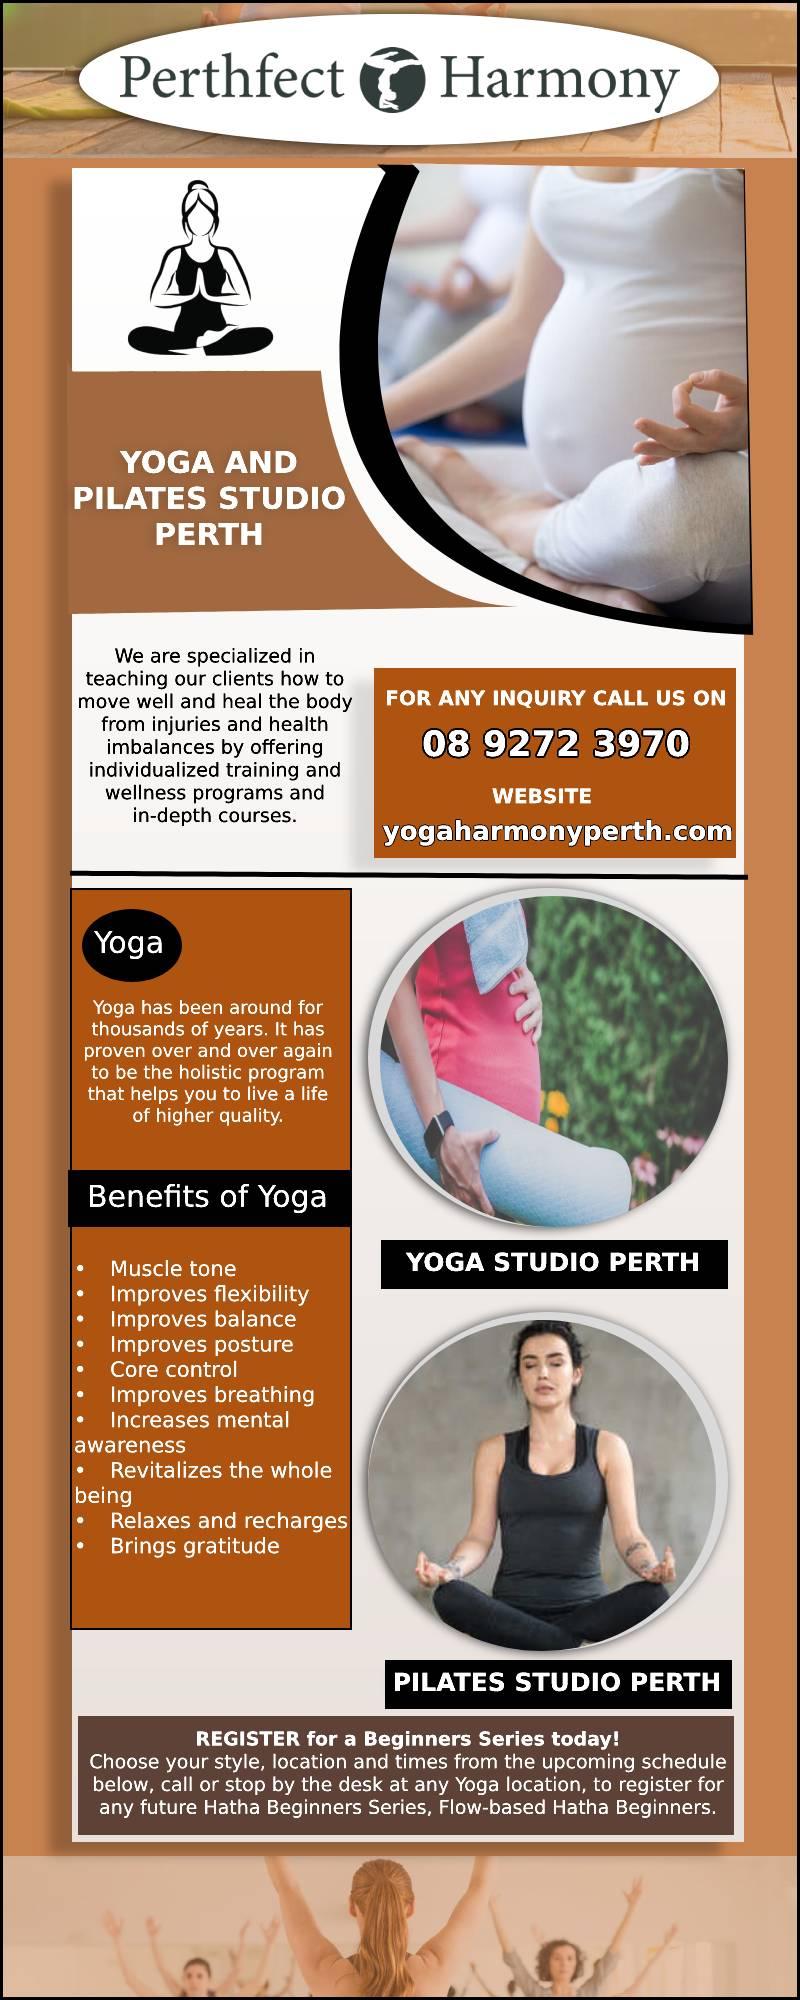 Yoga and Pilates studio Perth   Yoga Harmony Perth